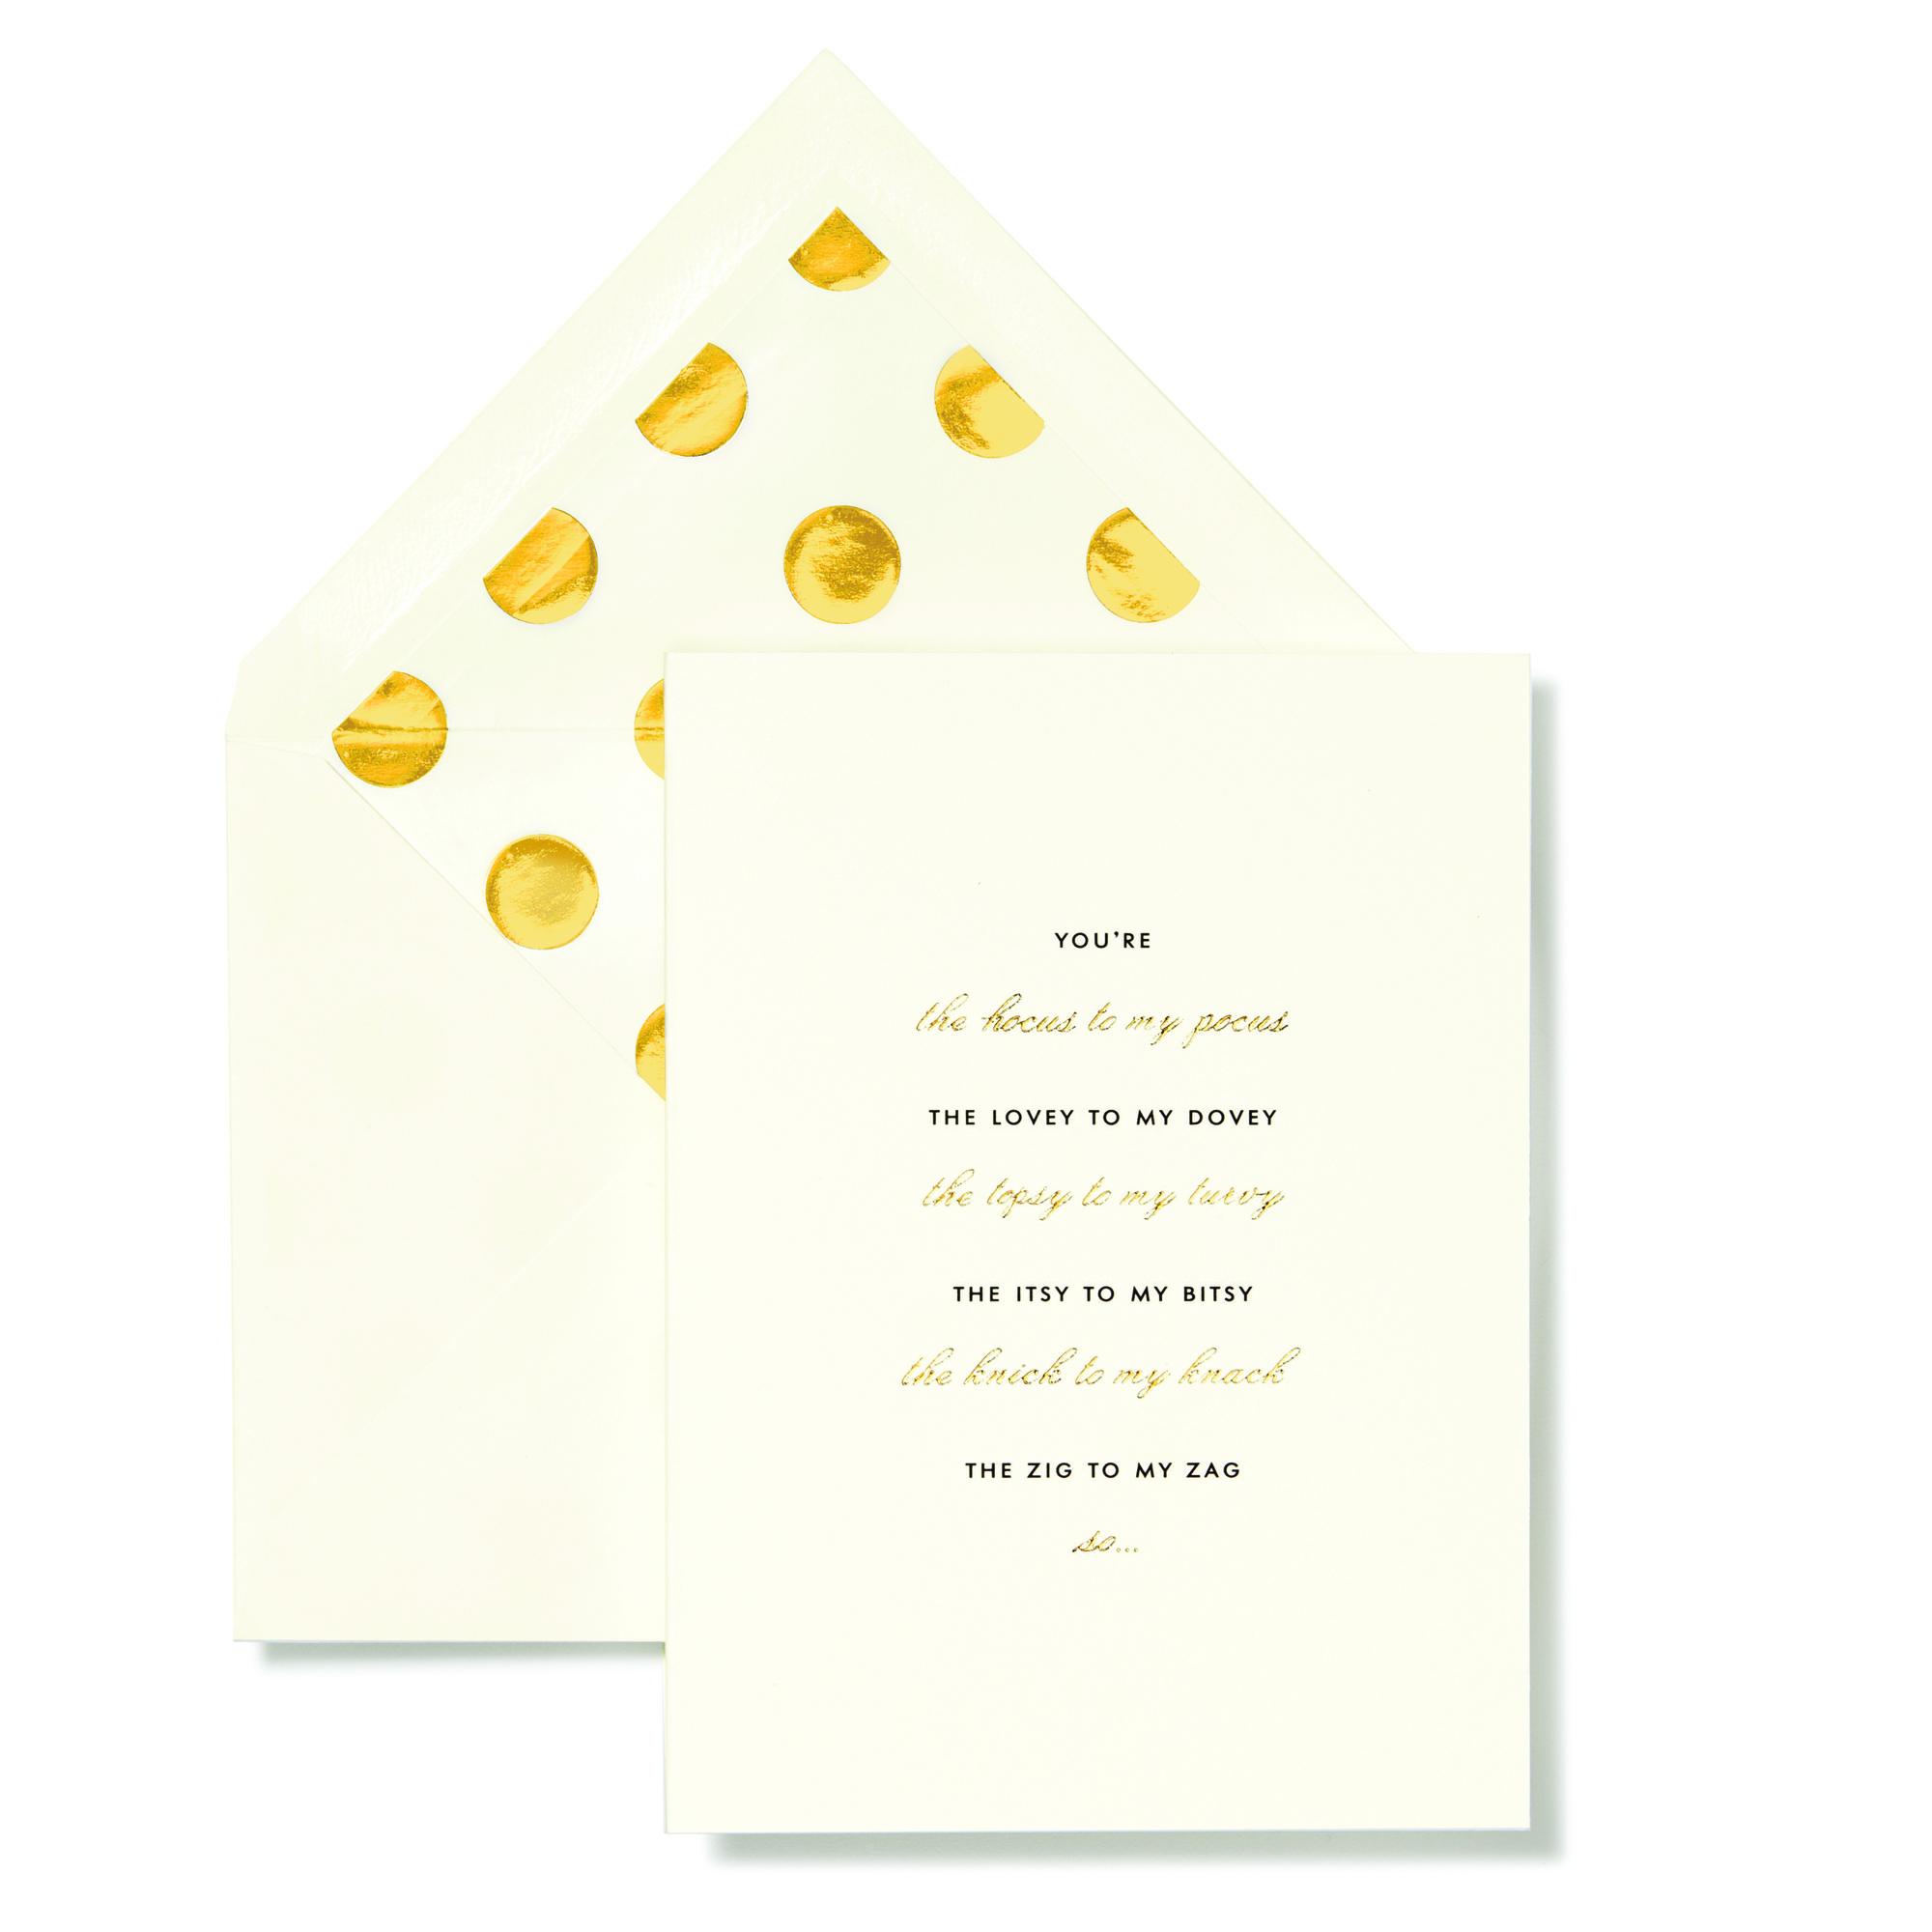 112_Bridesmaid_Card_Set_Hocus_to_my-Pocus.jpg